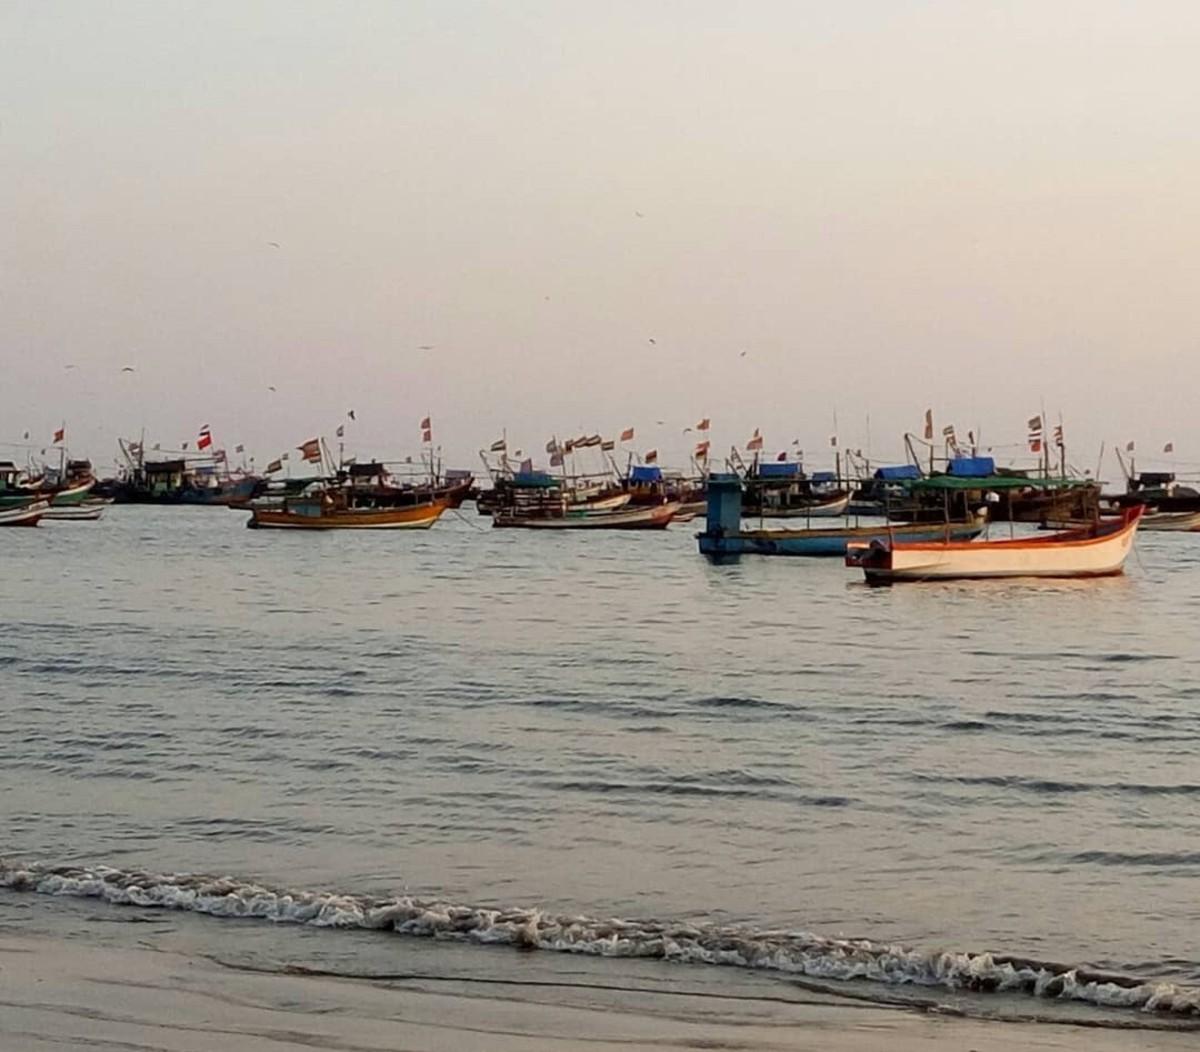 Boats floating on the sea, Tarkarli.